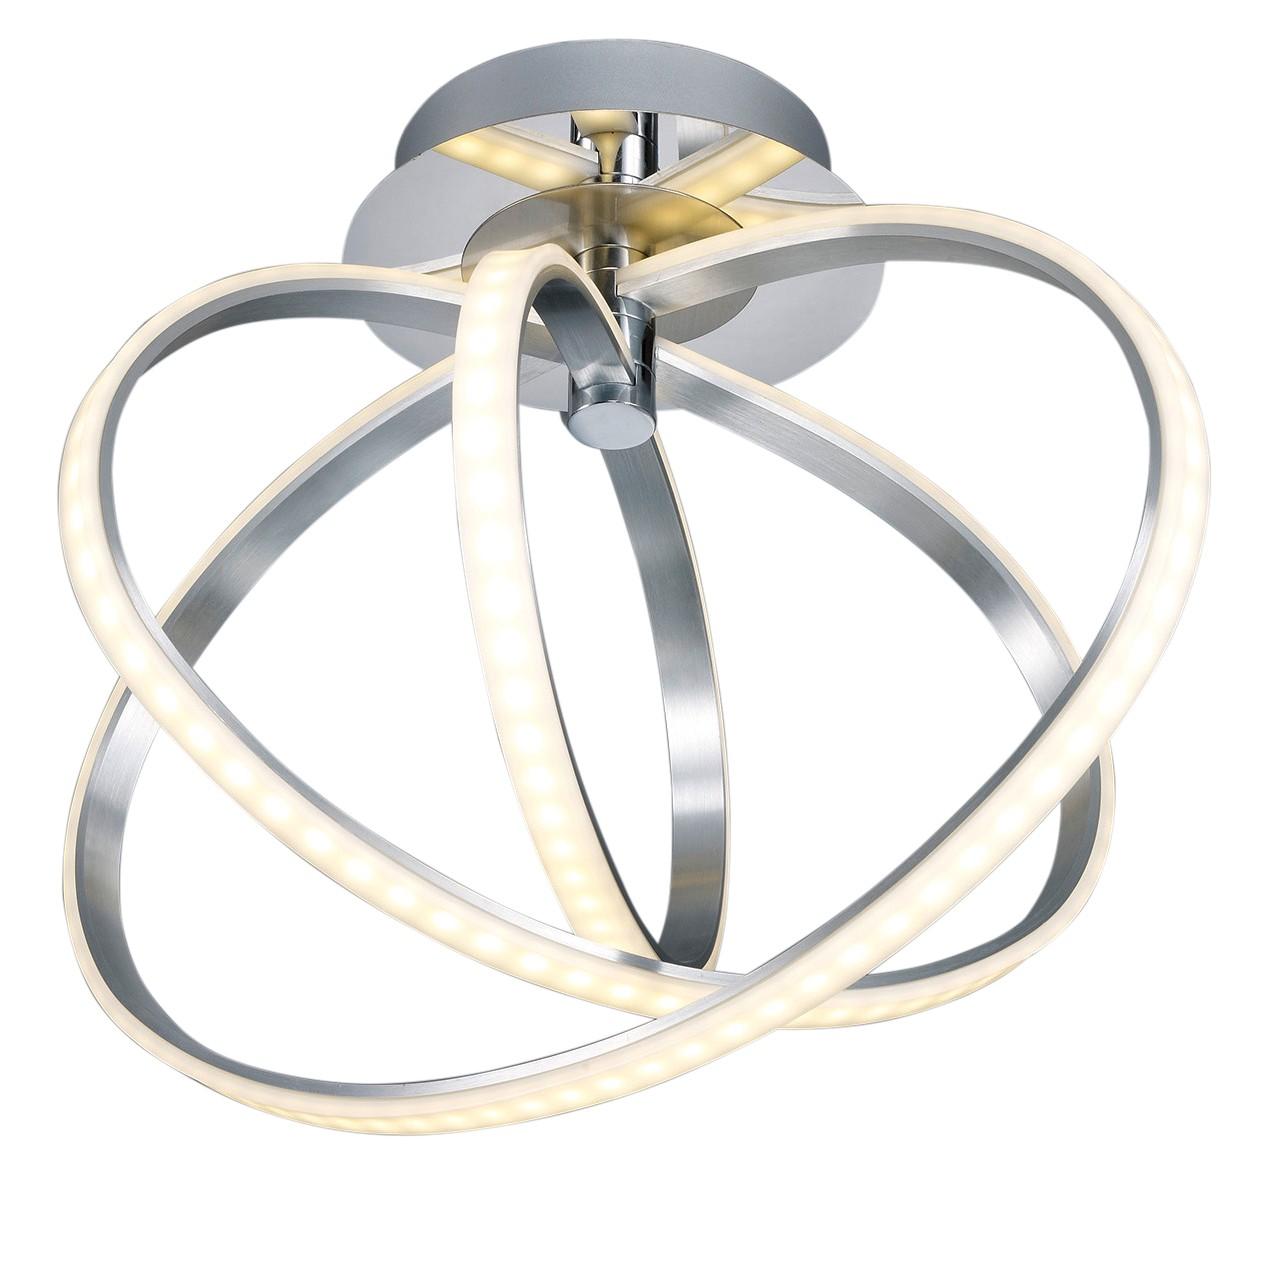 EEK A+, LED-Deckenleuchte Corland - Metall / Acryl - 1-flammig, Trio